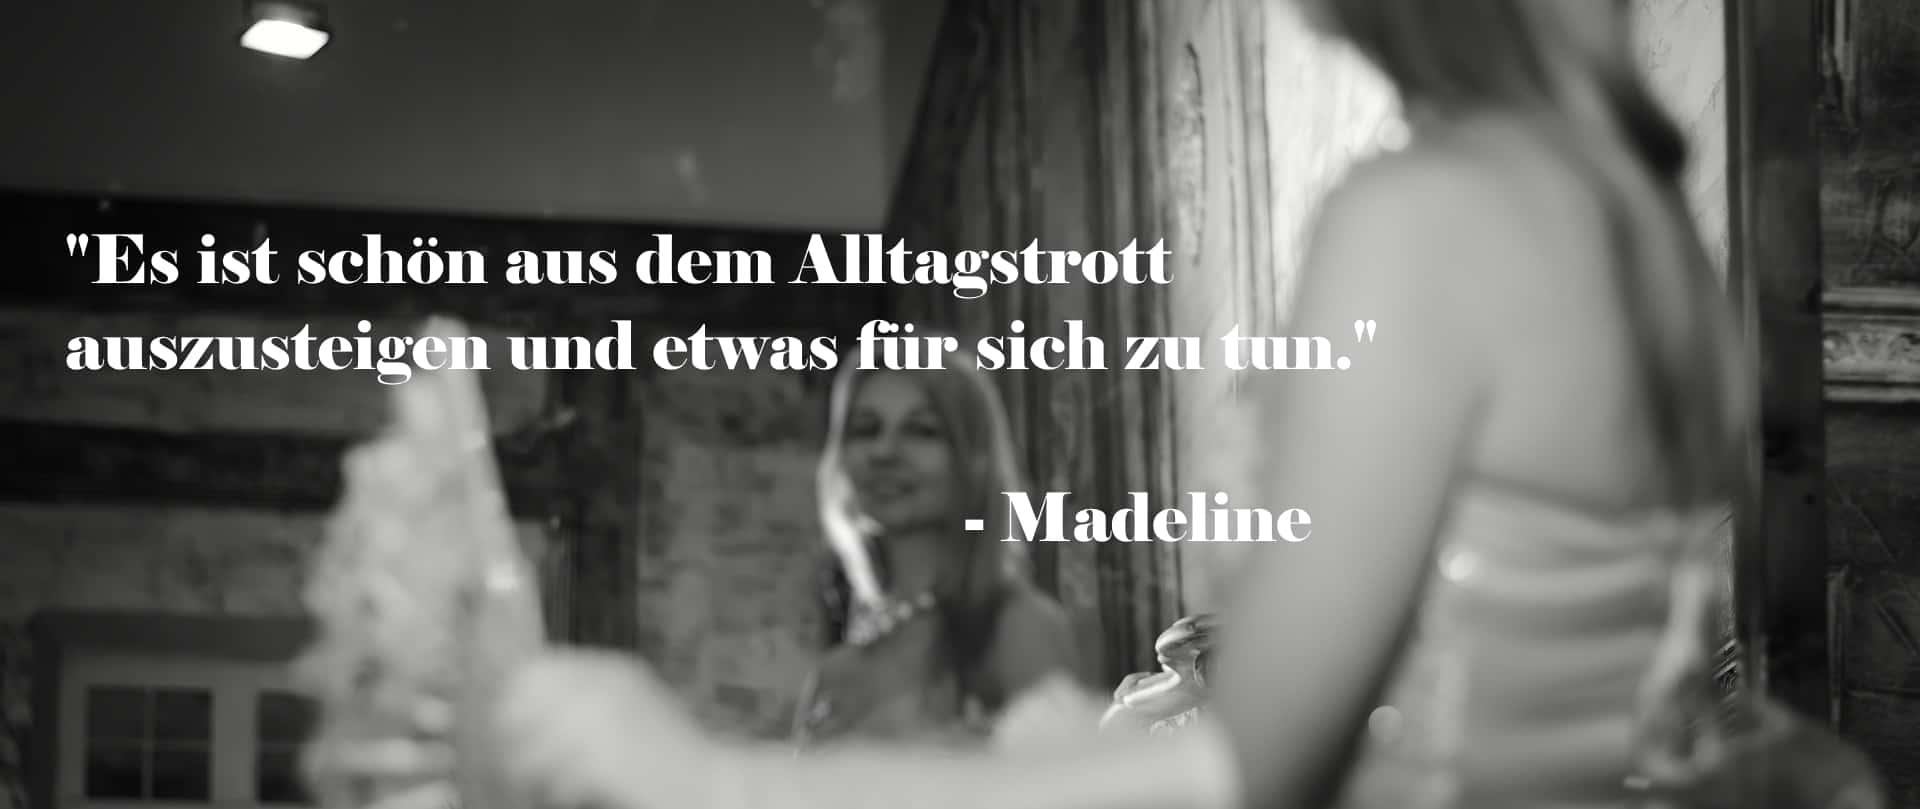 Elinesque Showlesque Burlesque Kundenmeinung Madeline